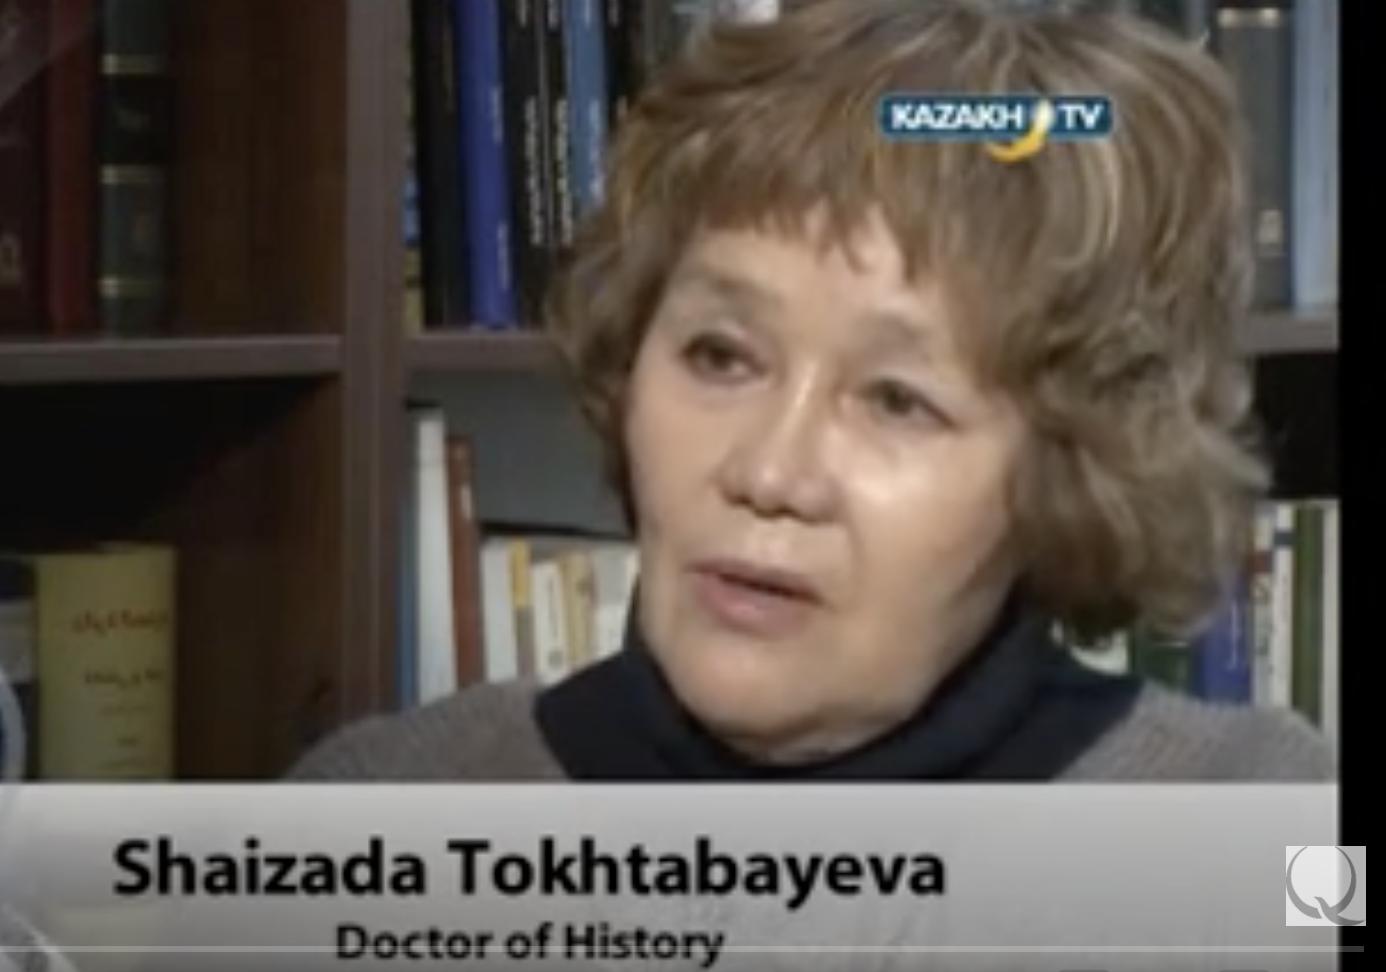 Shaizada Tokhtabayeva